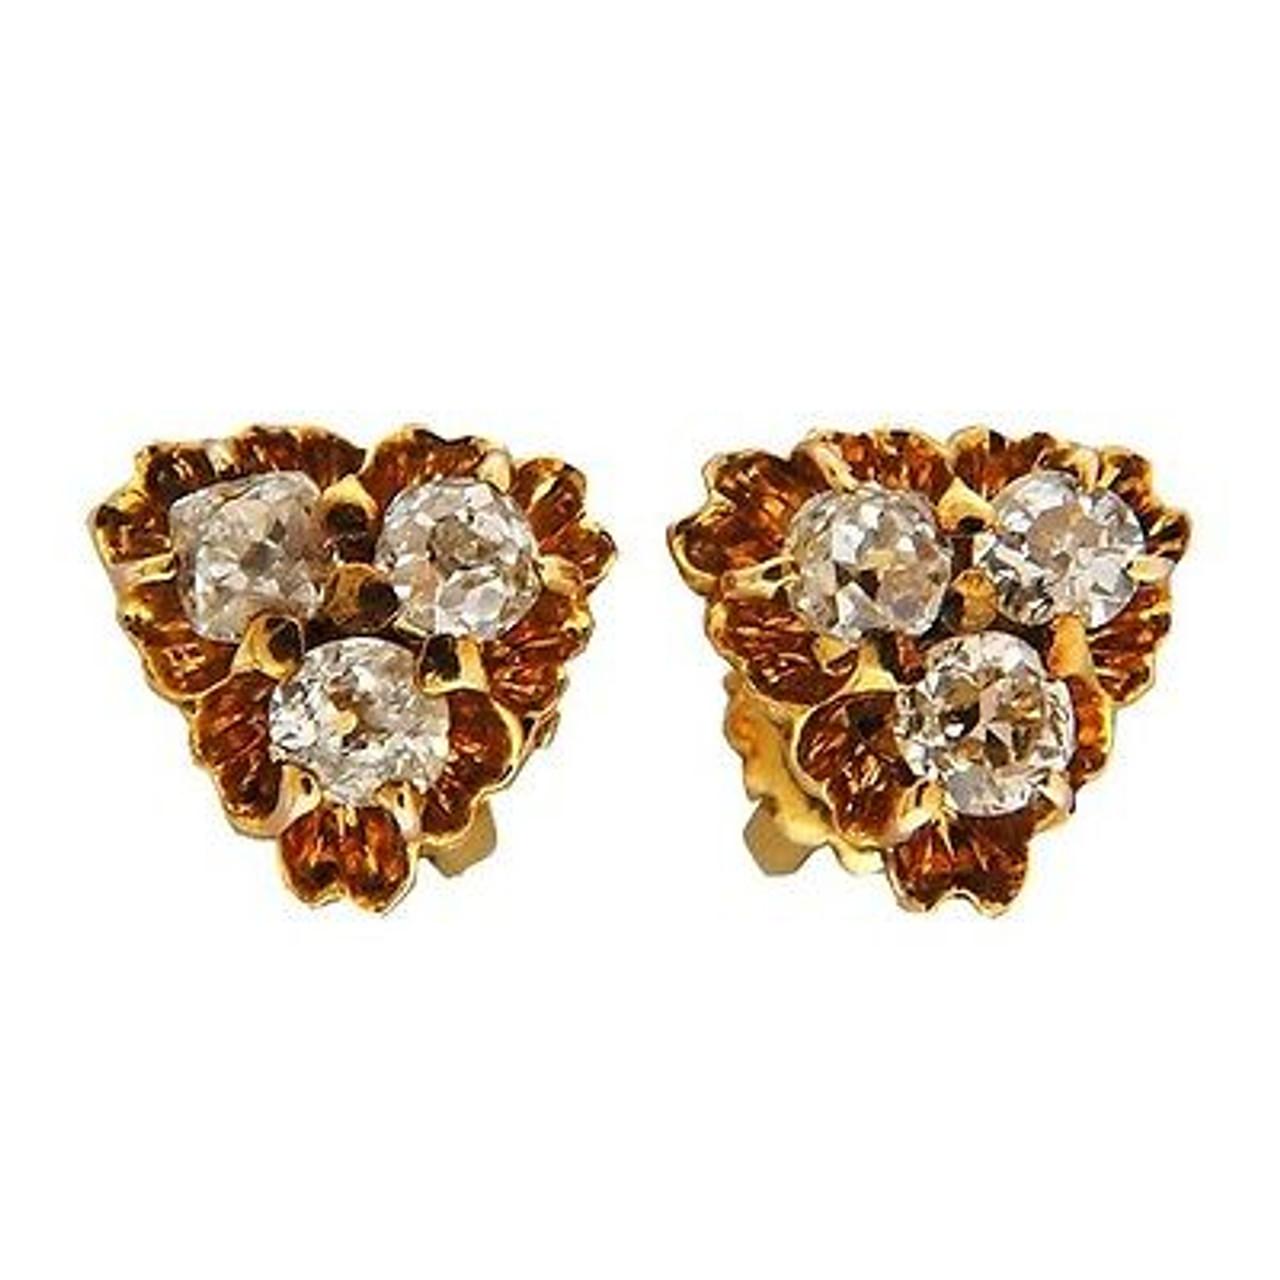 50ct Old Mine Cut Diamond Pink Gold Victorian Threaded Screw Back Earrings Petersuchyjewelers